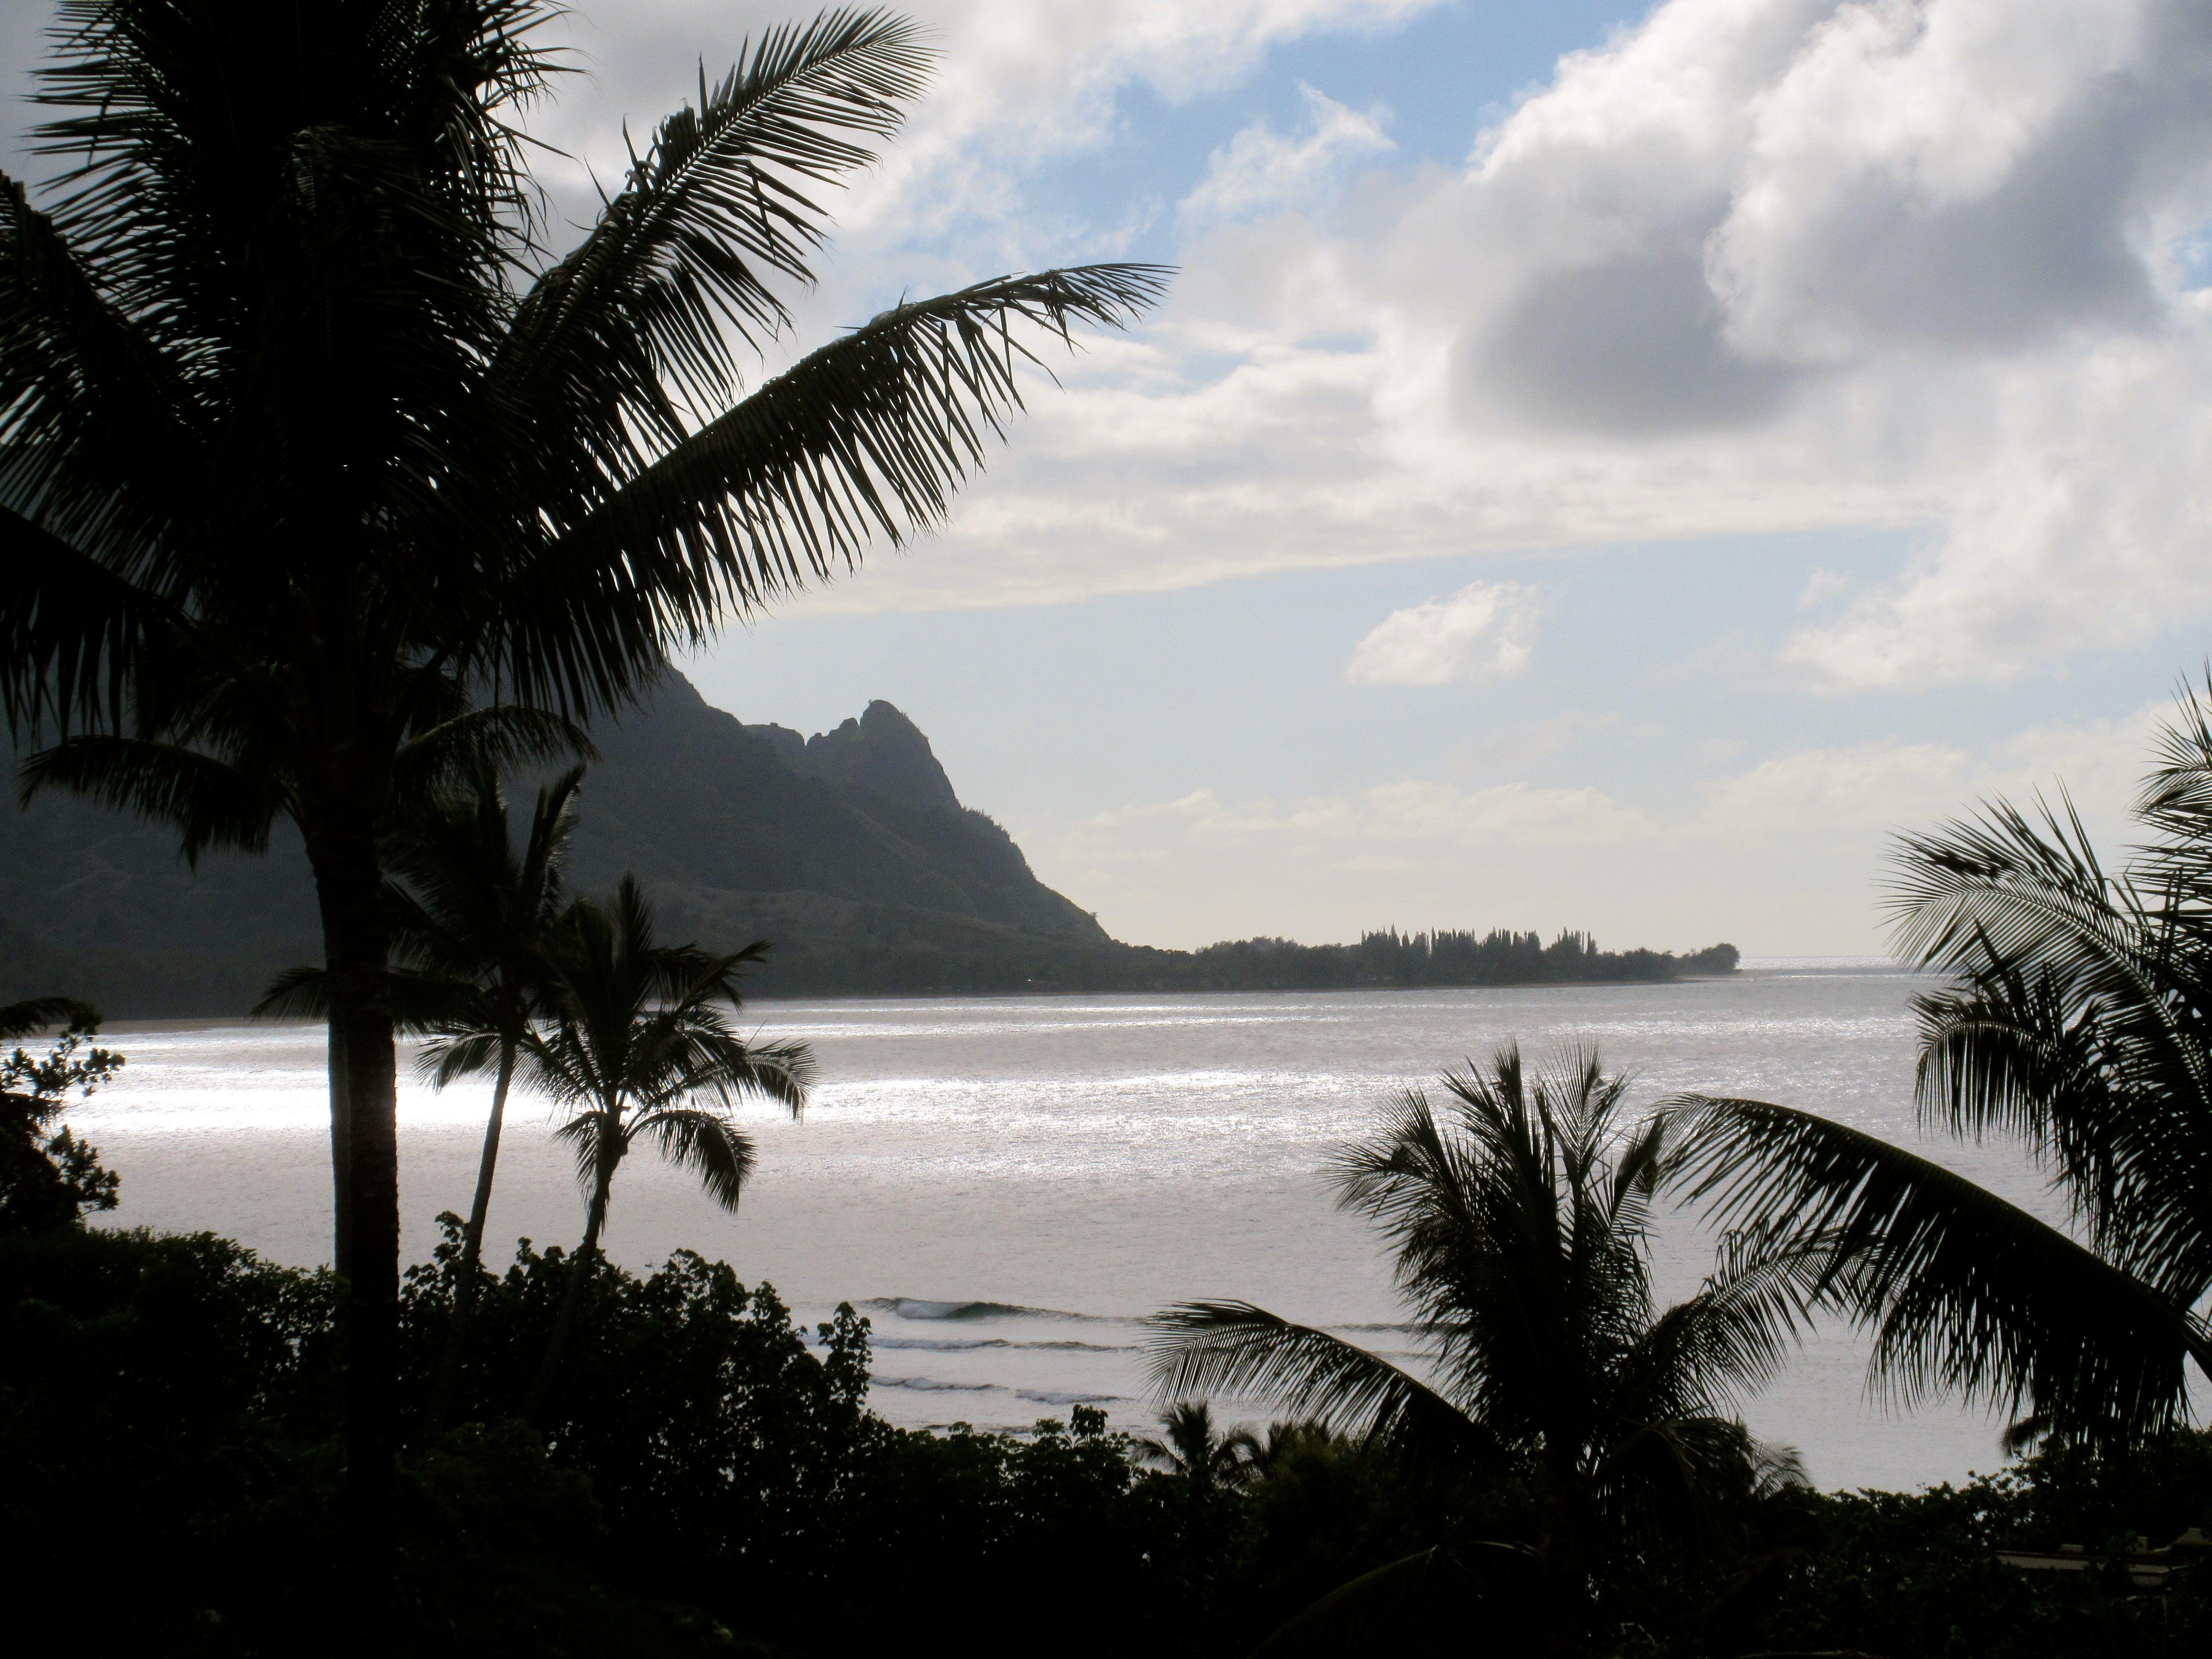 view from Princeville, Kauai Bali Hai Kauai, Hawaiian